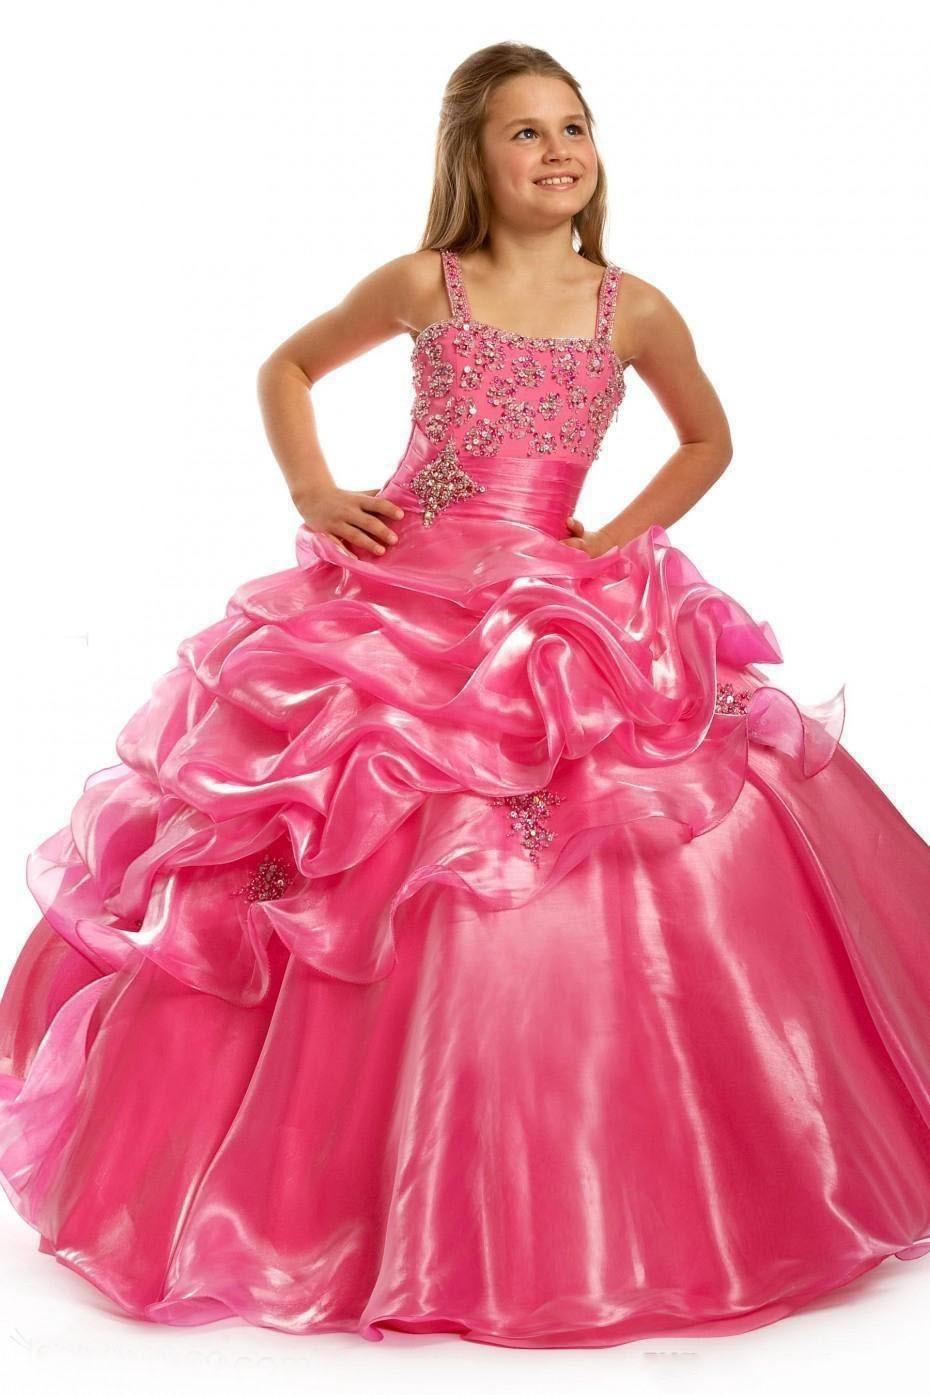 Фото красивого платья на девочку